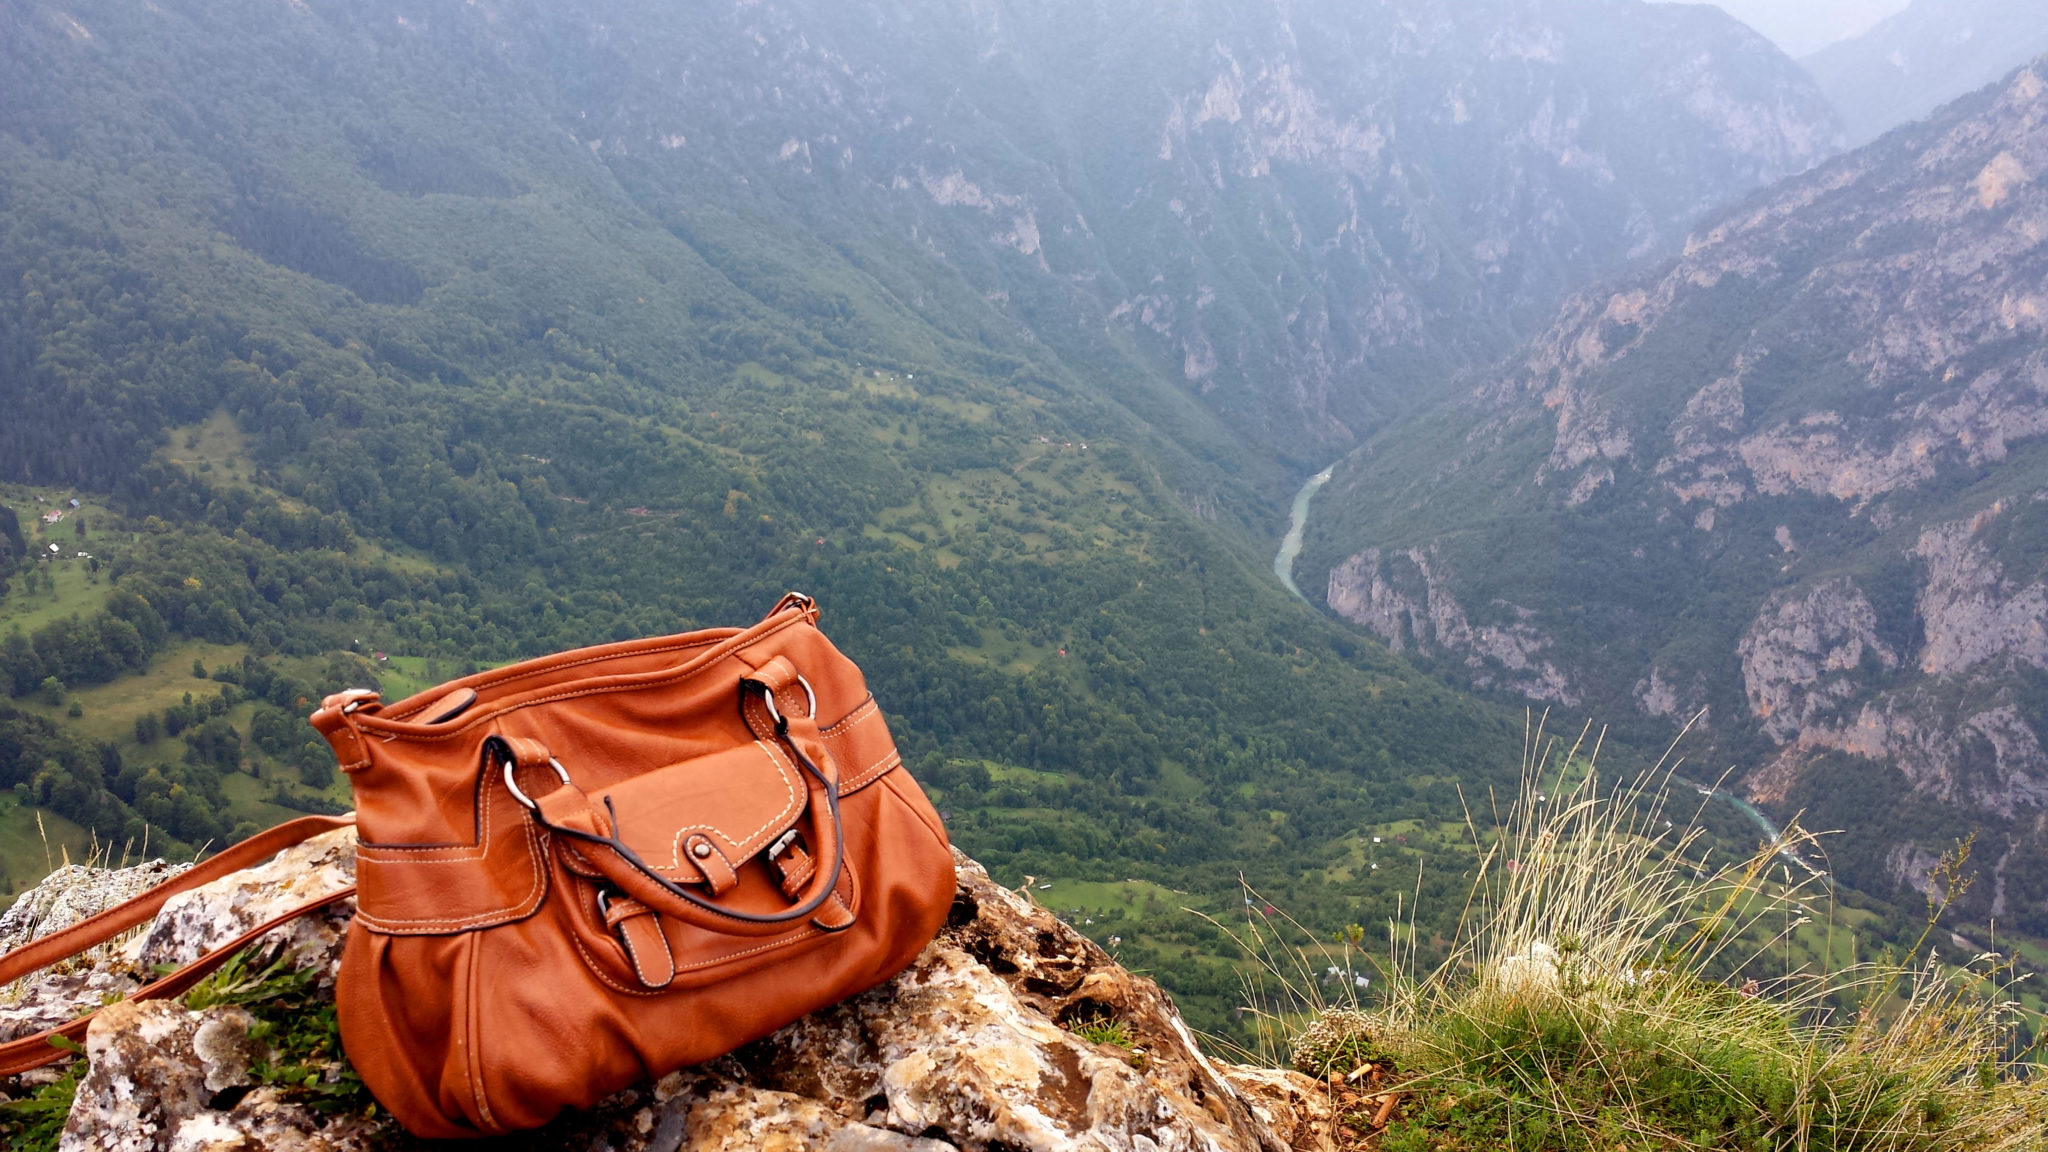 Hemaposesesvalises_montenegro_la_randonnee_champignon_voyage_travel_blog8